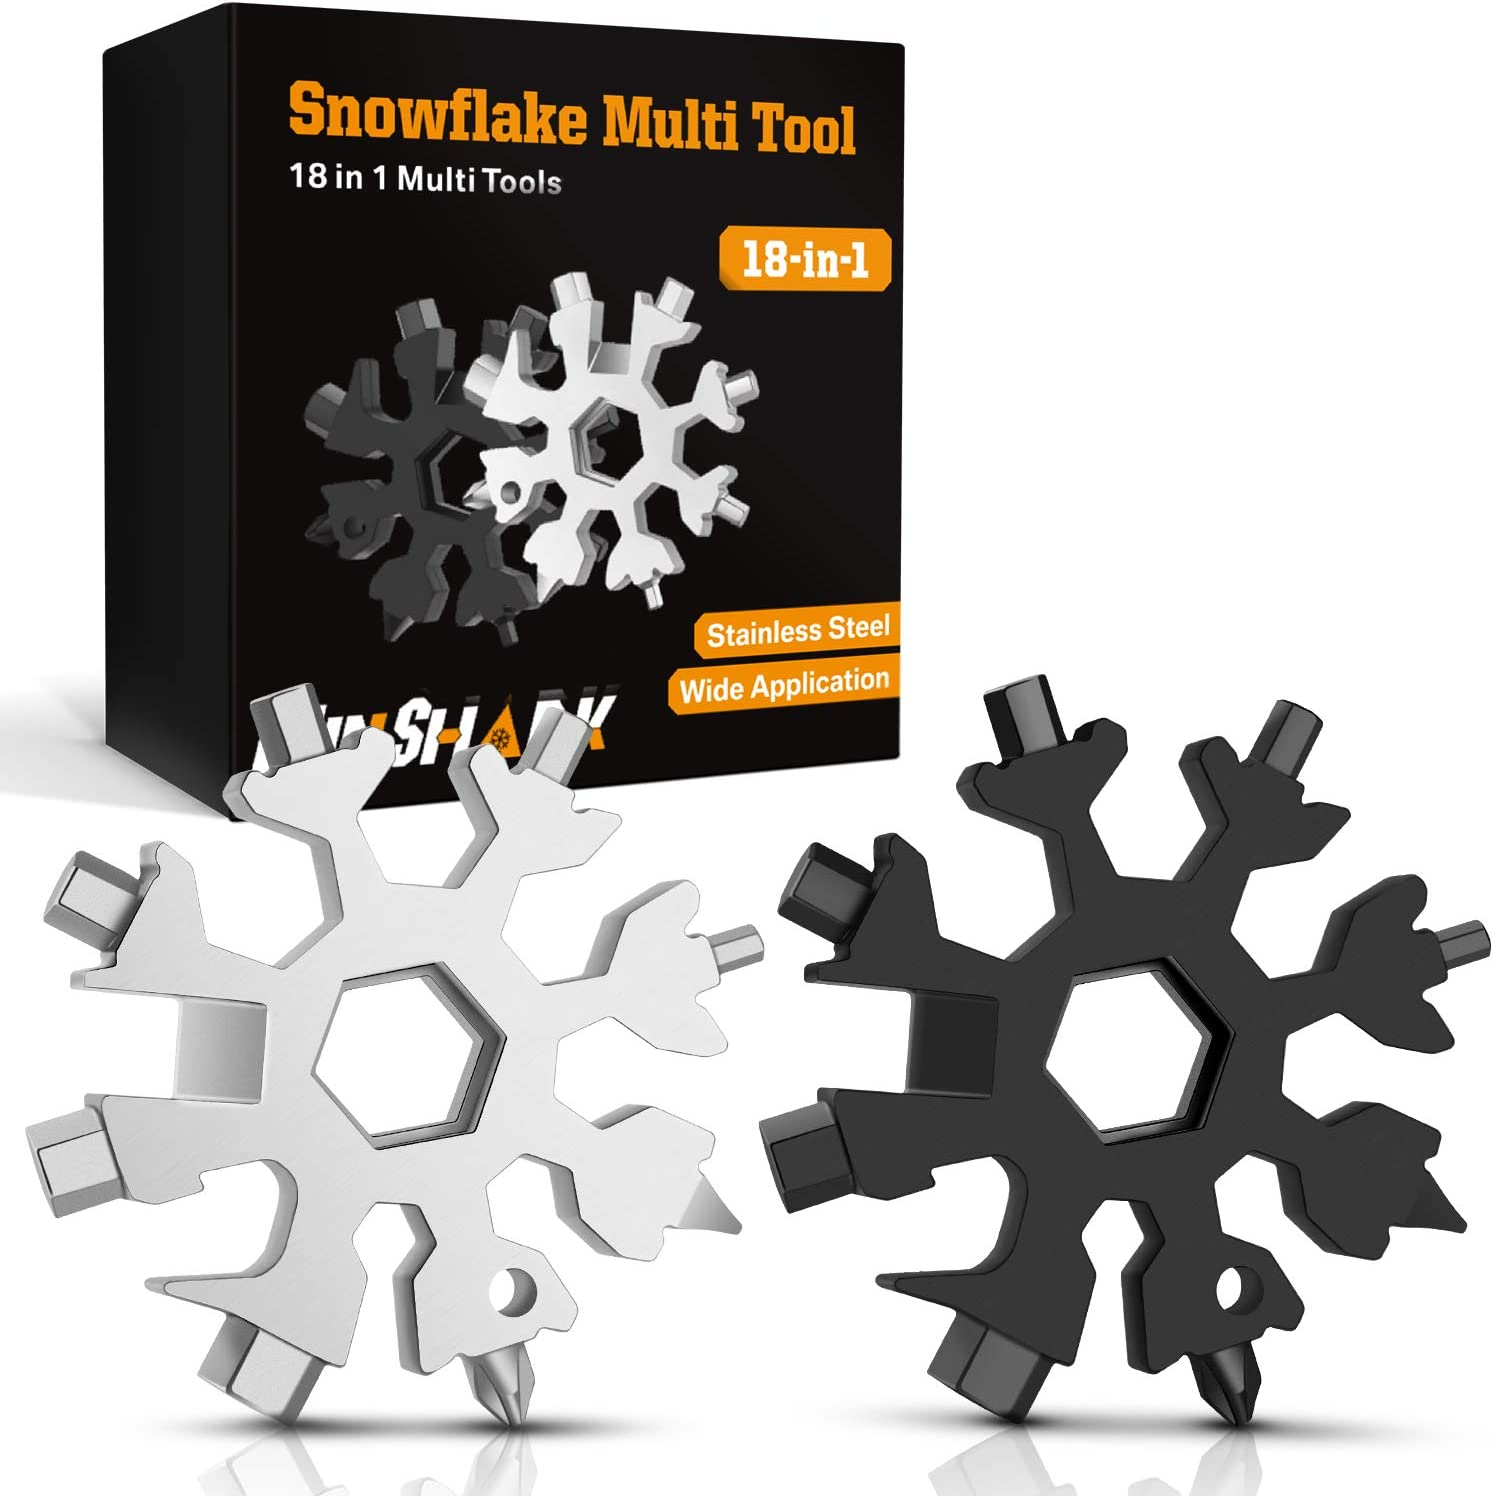 LIZHIGE Snowflake Multi Tool 18-in-1 Cacciavite Portatile,Scheda Multifunzione,